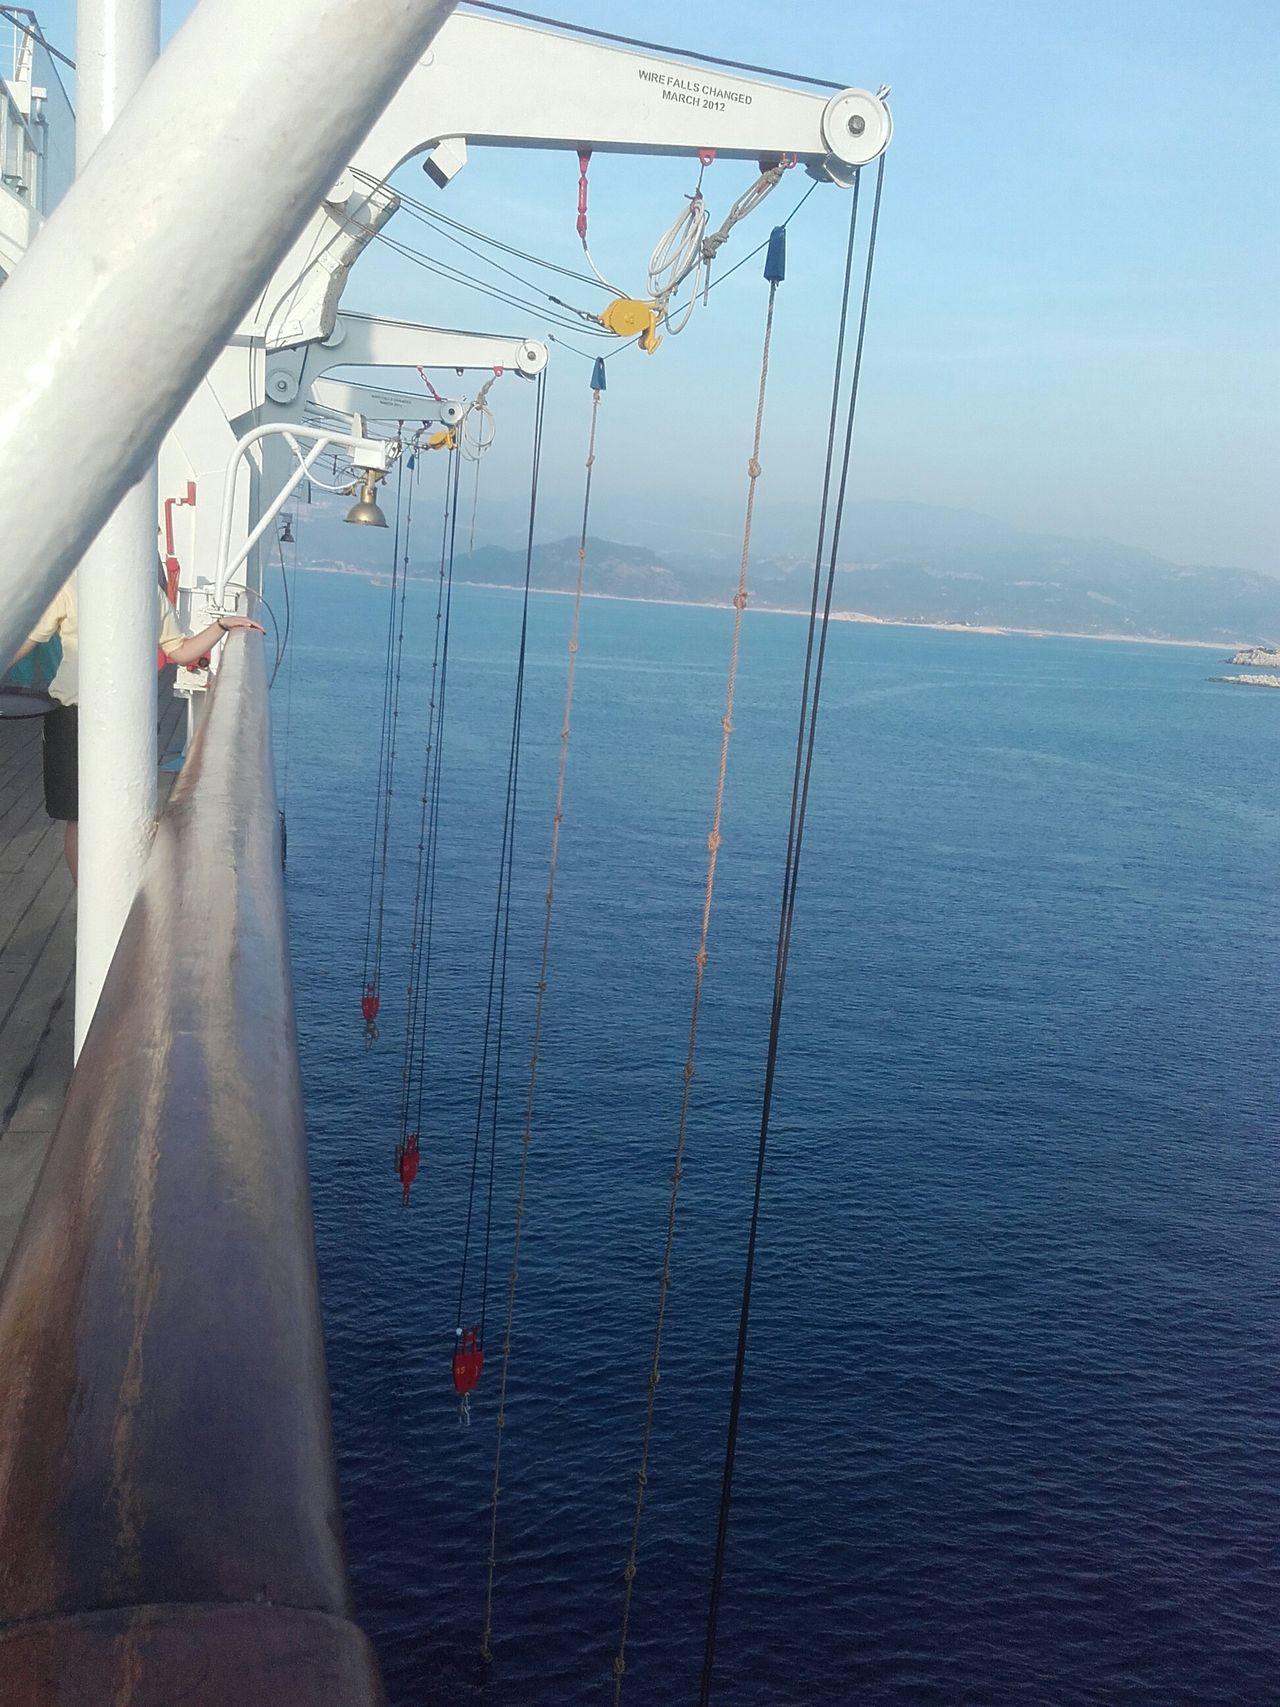 Lifeboat Winch Cruise Ship Taking Photos Kastellorizo 450 Inhabitants Boats Boats Boats